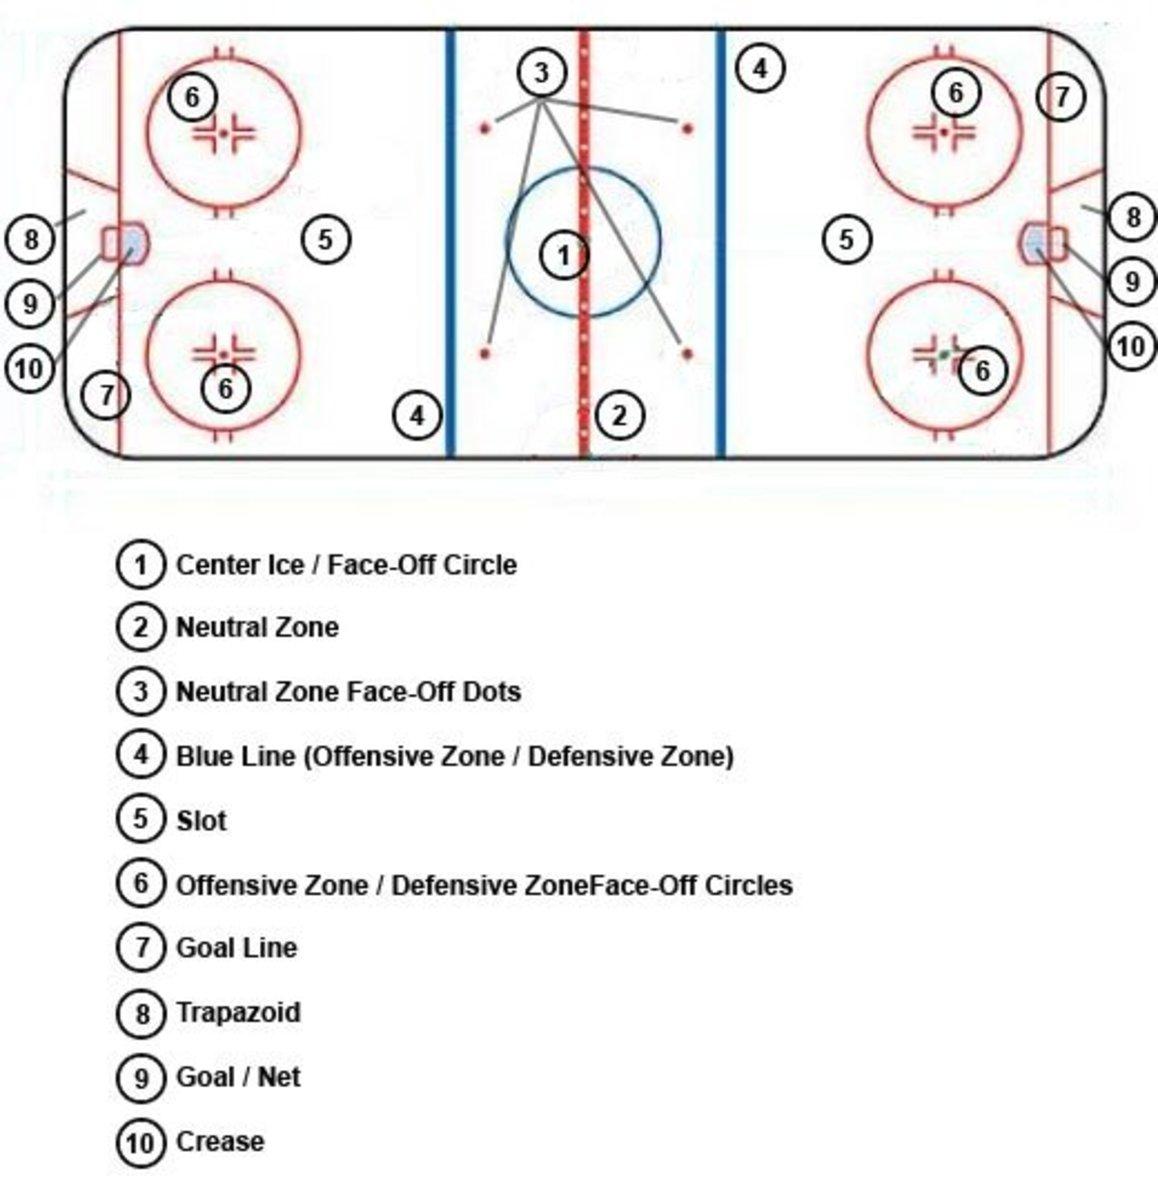 rules of ice hockey